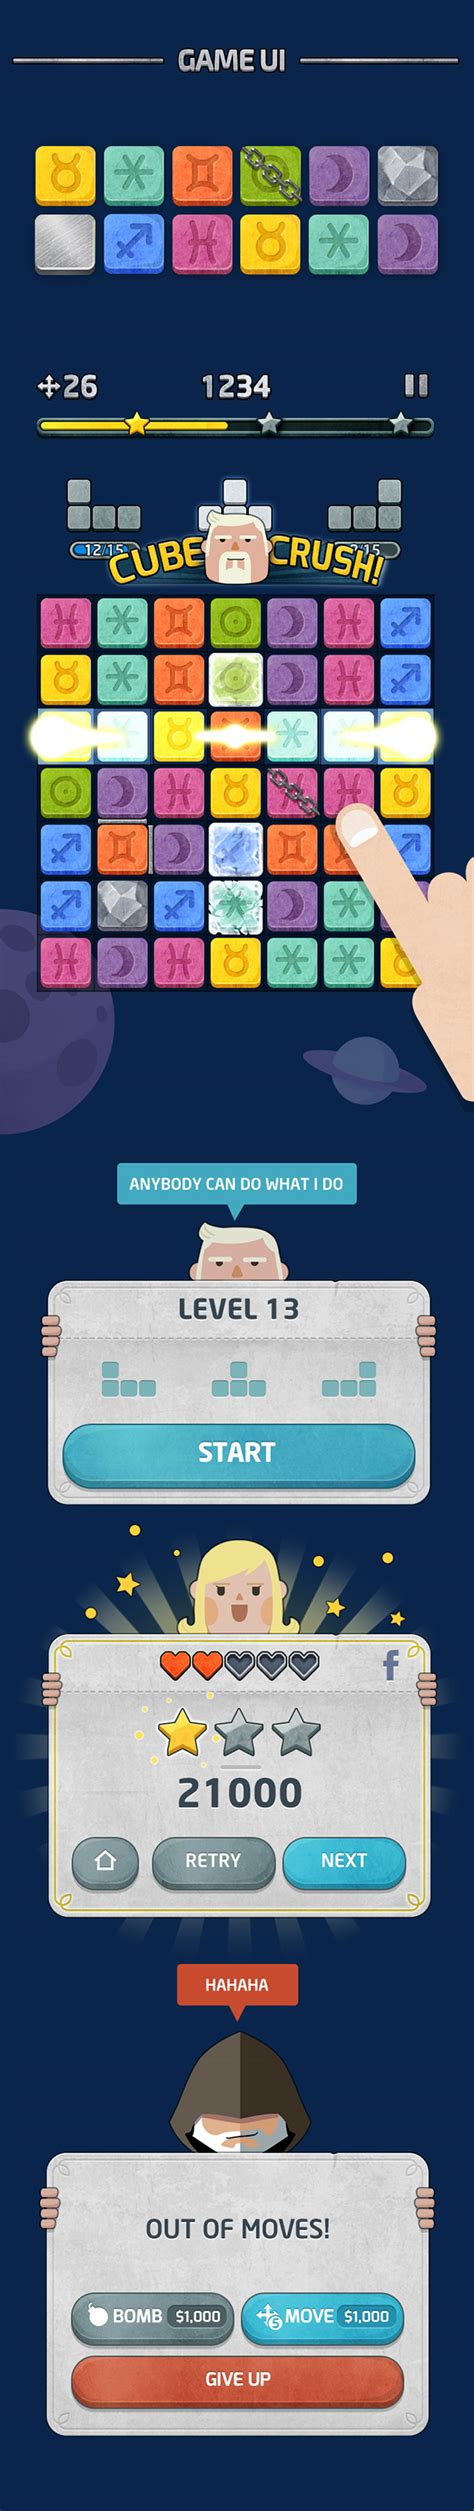 game design master cube master game design on behance